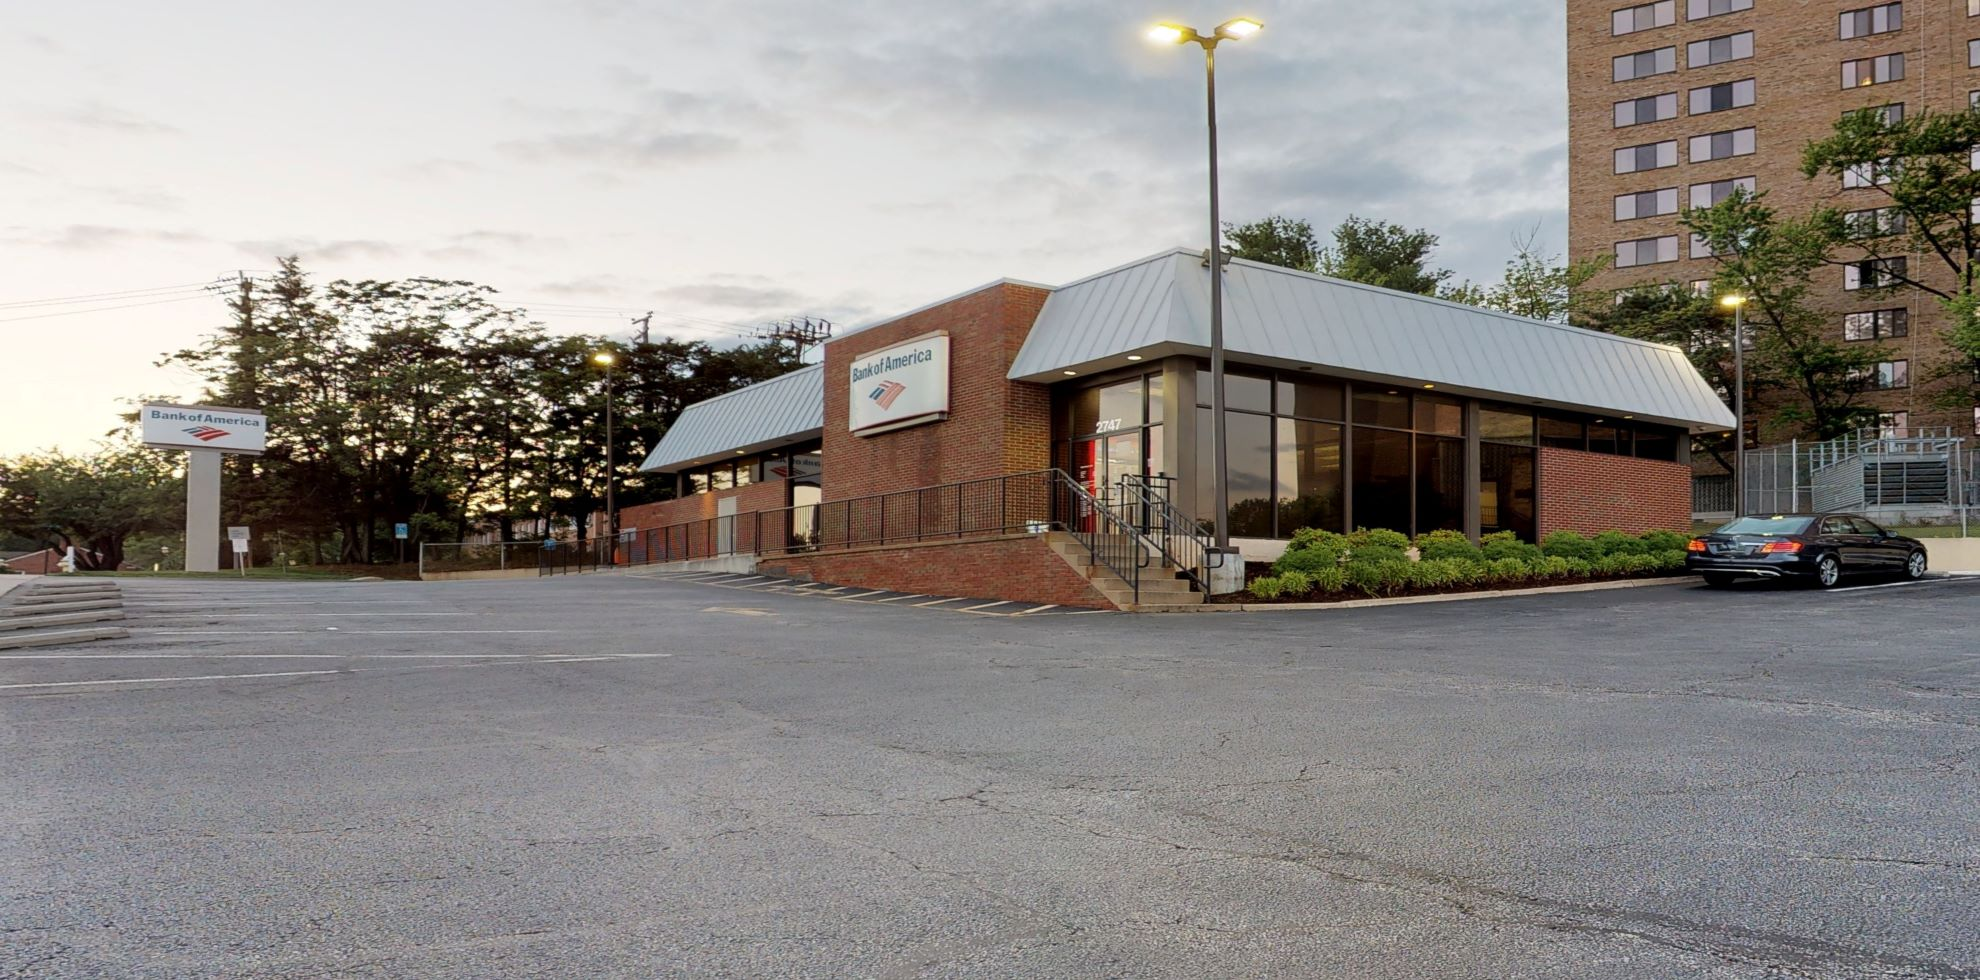 Bank of America financial center with drive-thru ATM   2747 Duke St, Alexandria, VA 22314